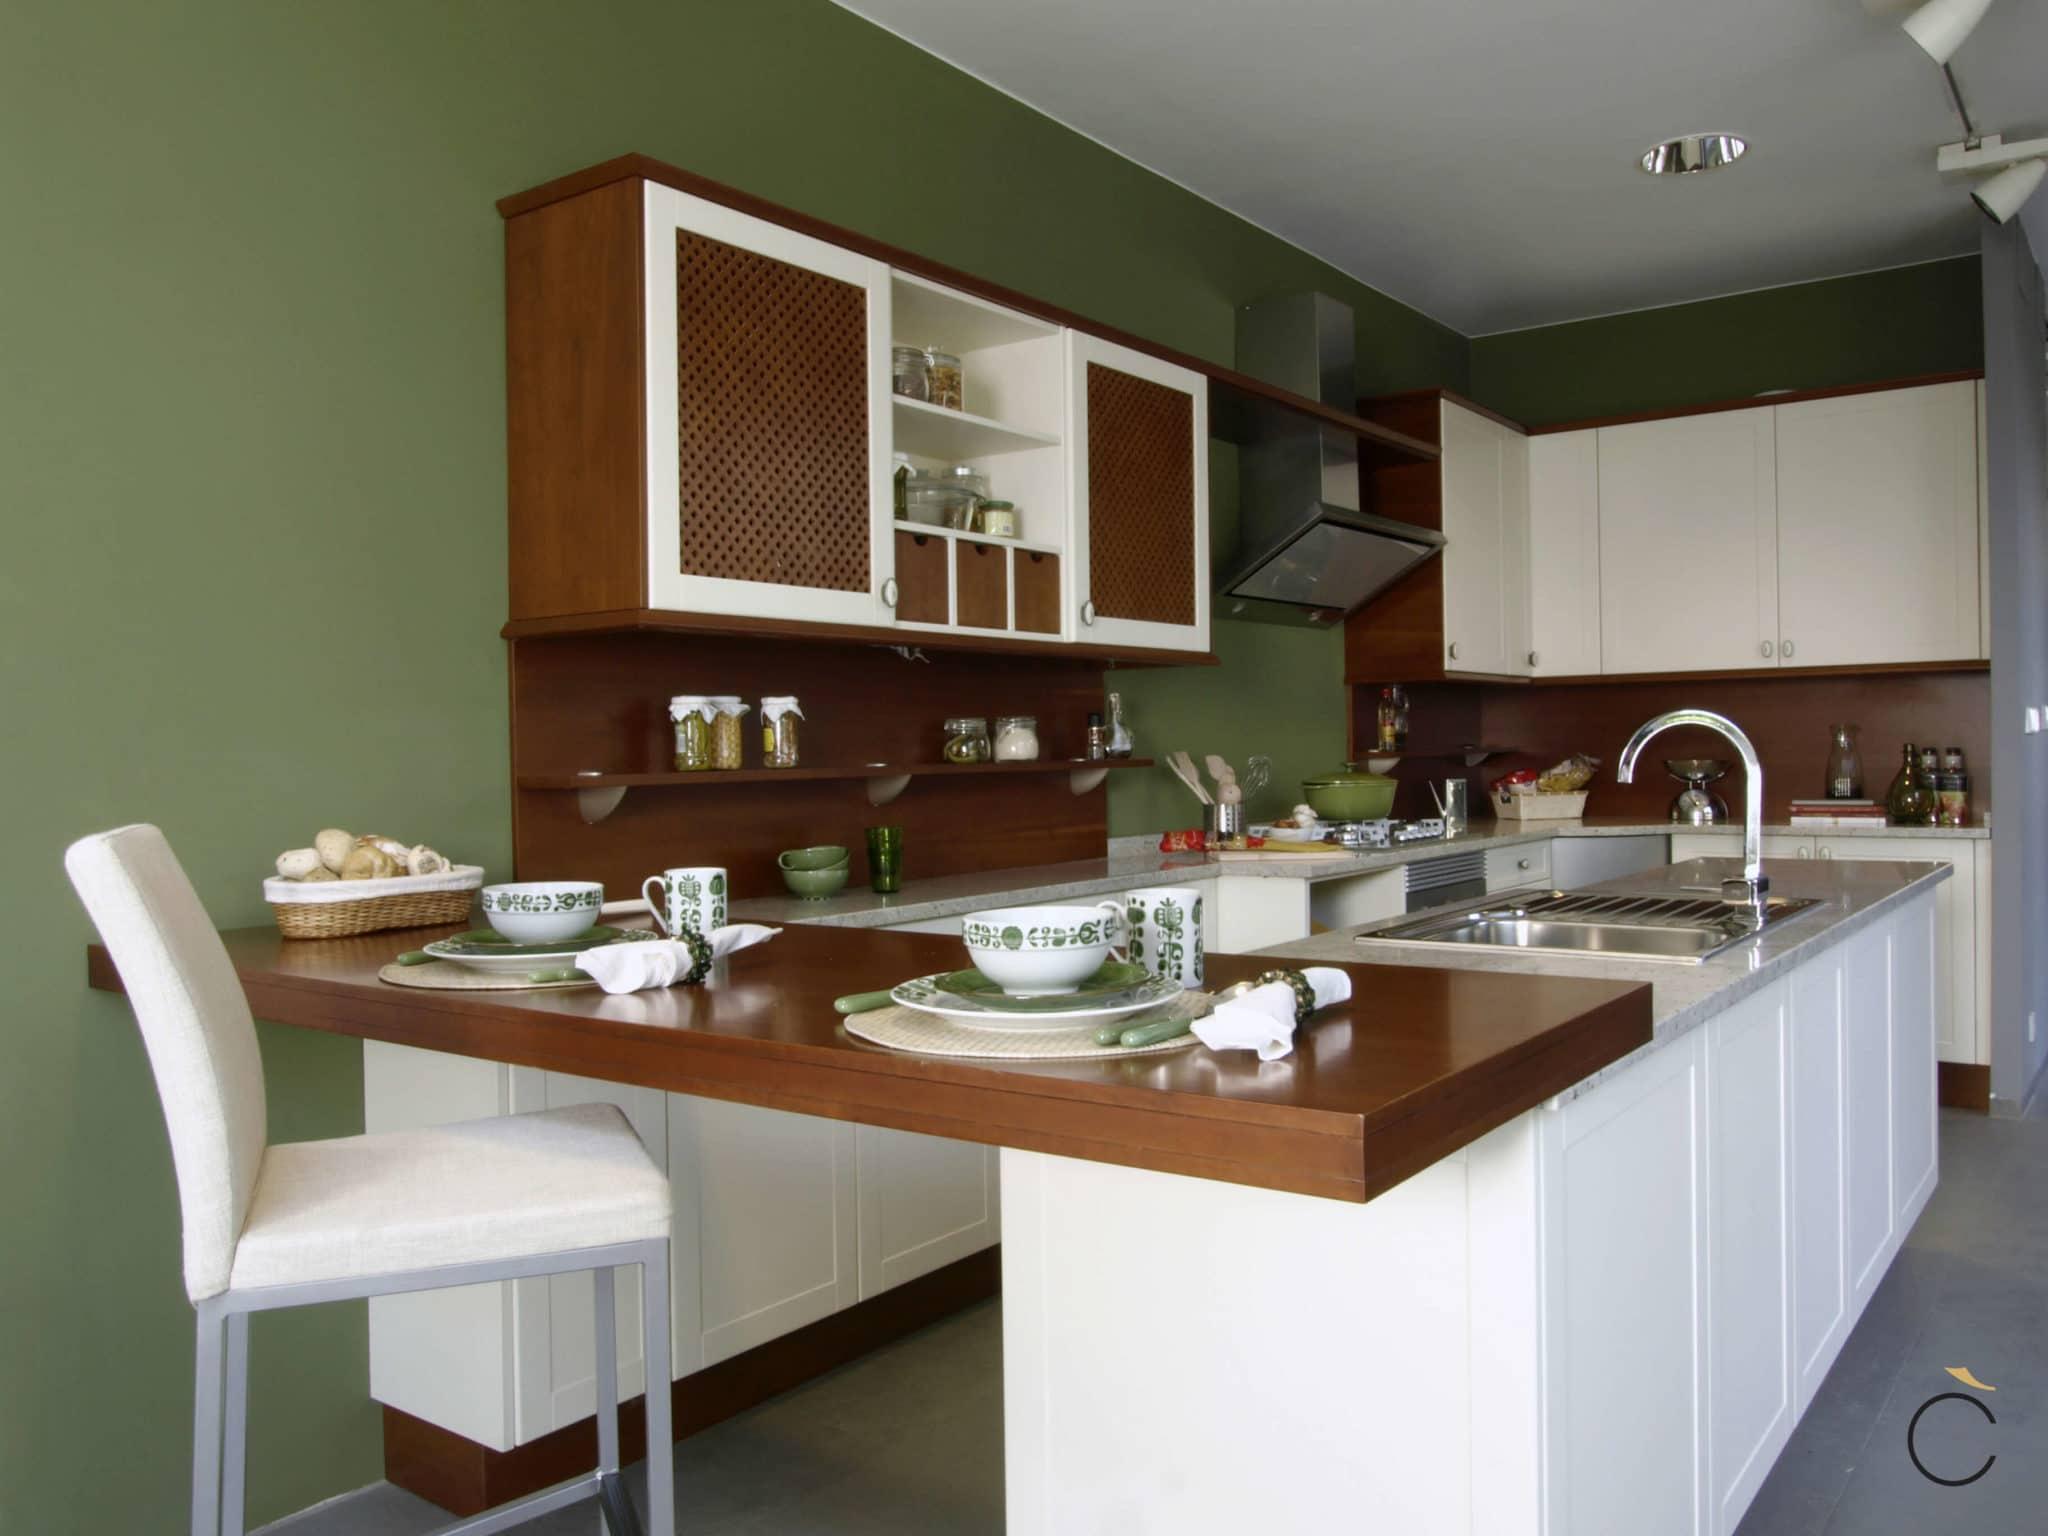 Cocinas r sticas modernas desc brelas en grupo coeco - Fotos de cocinas rusticas ...